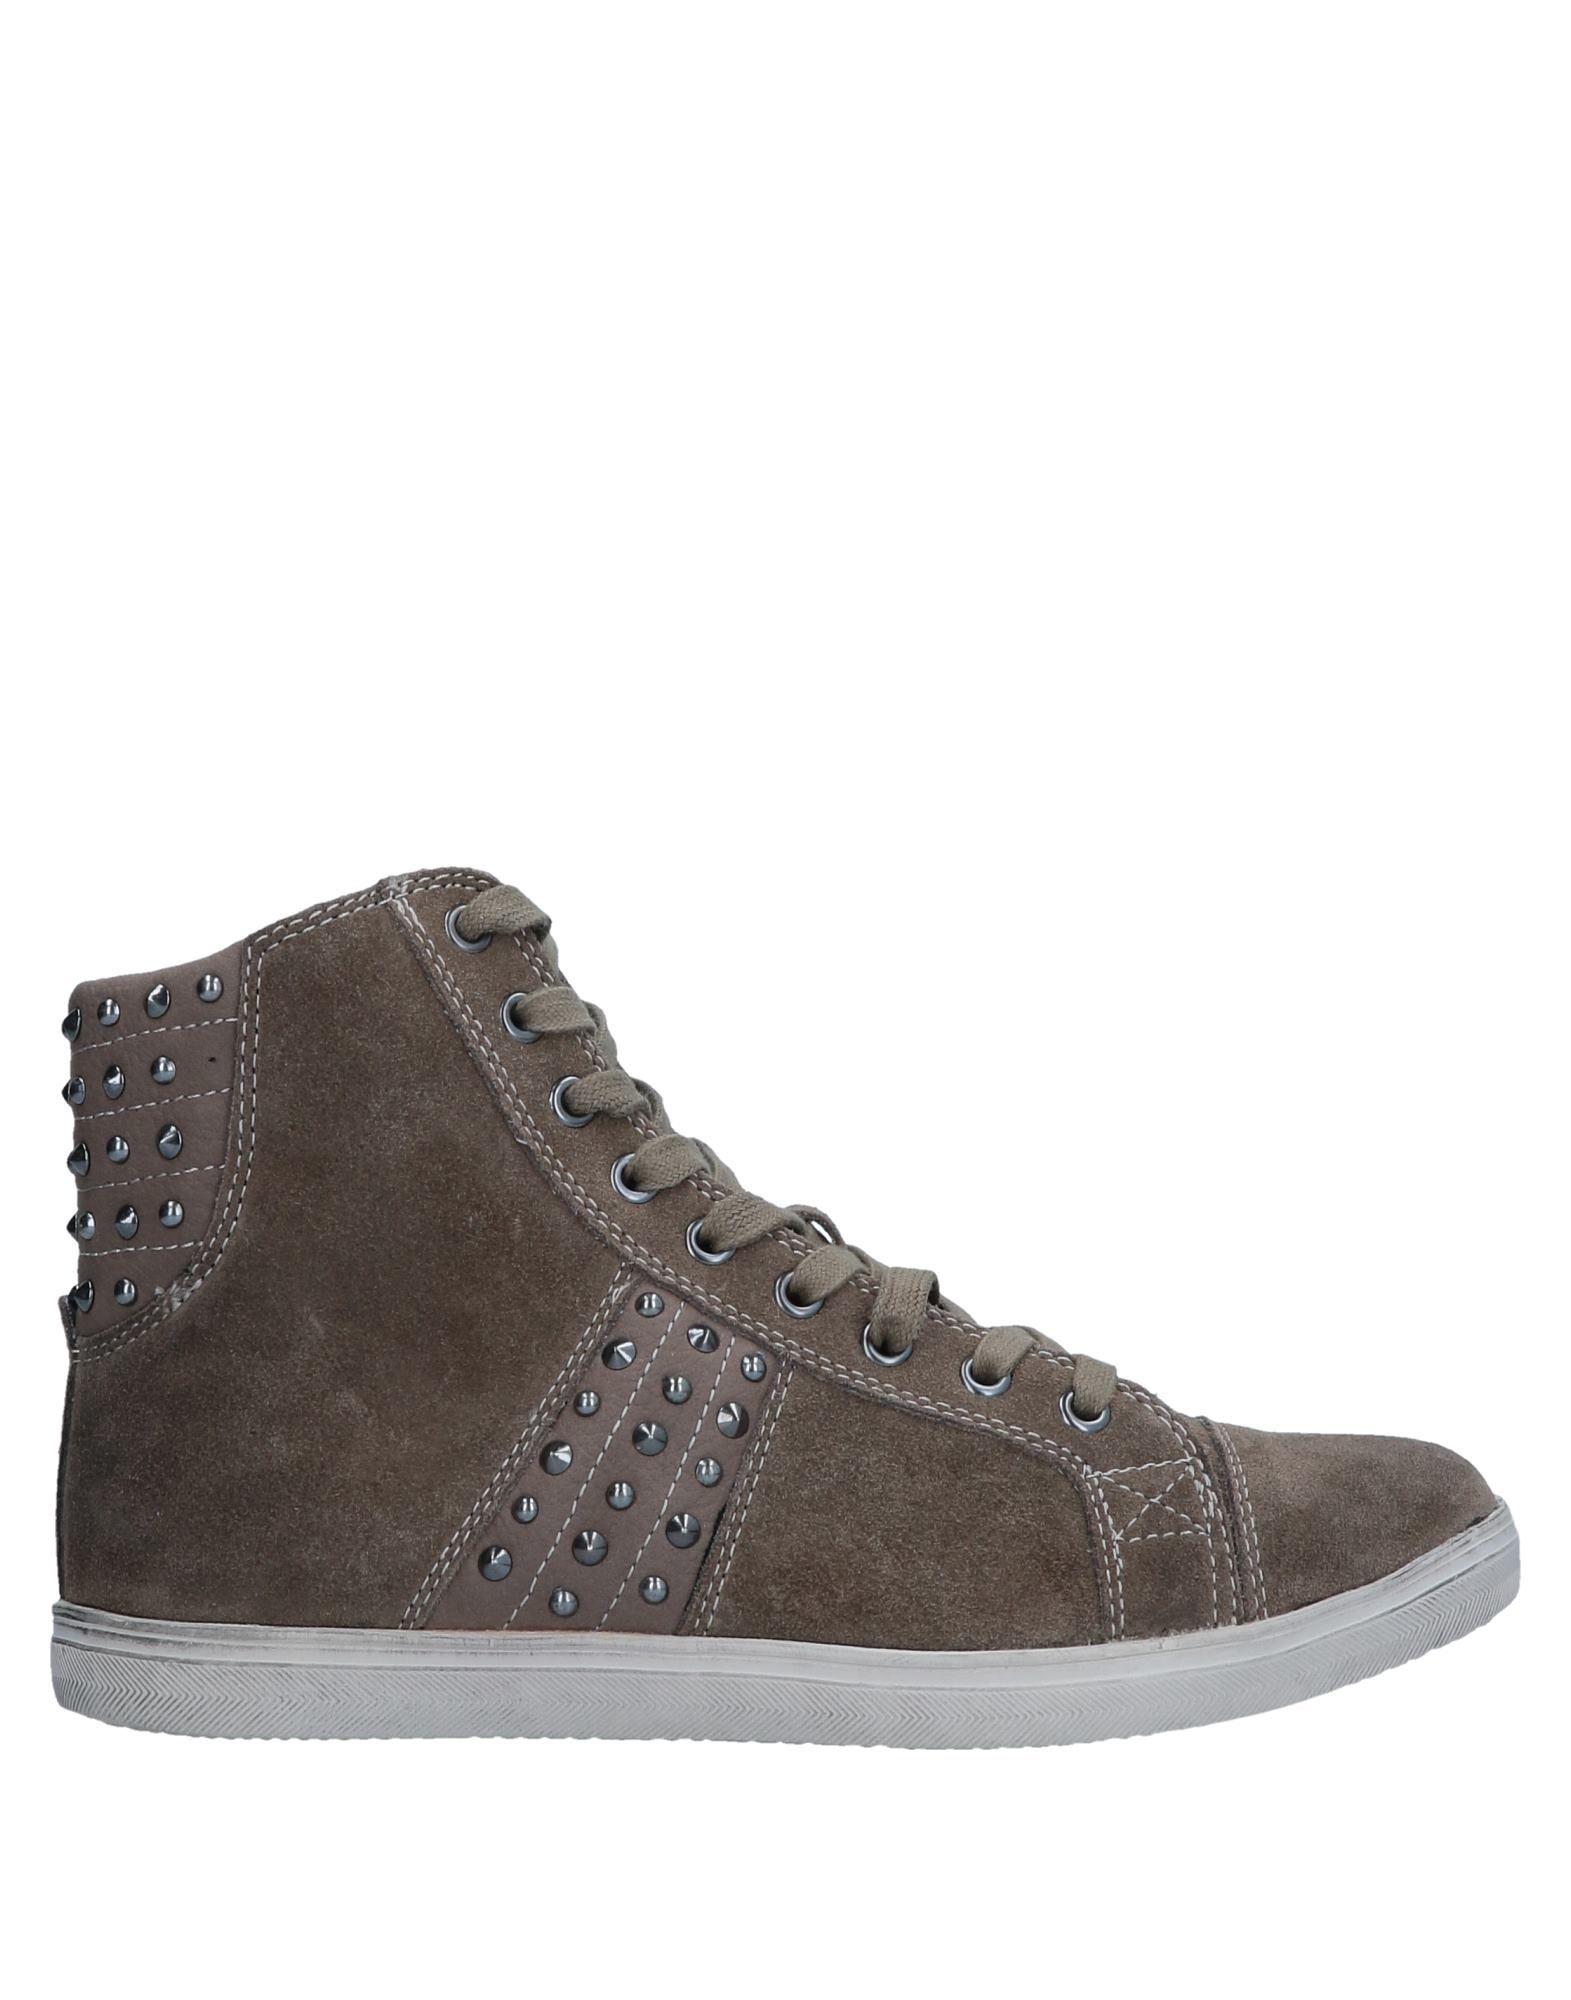 Gaudì Sneakers Damen  11554820XW Gute Qualität beliebte Schuhe